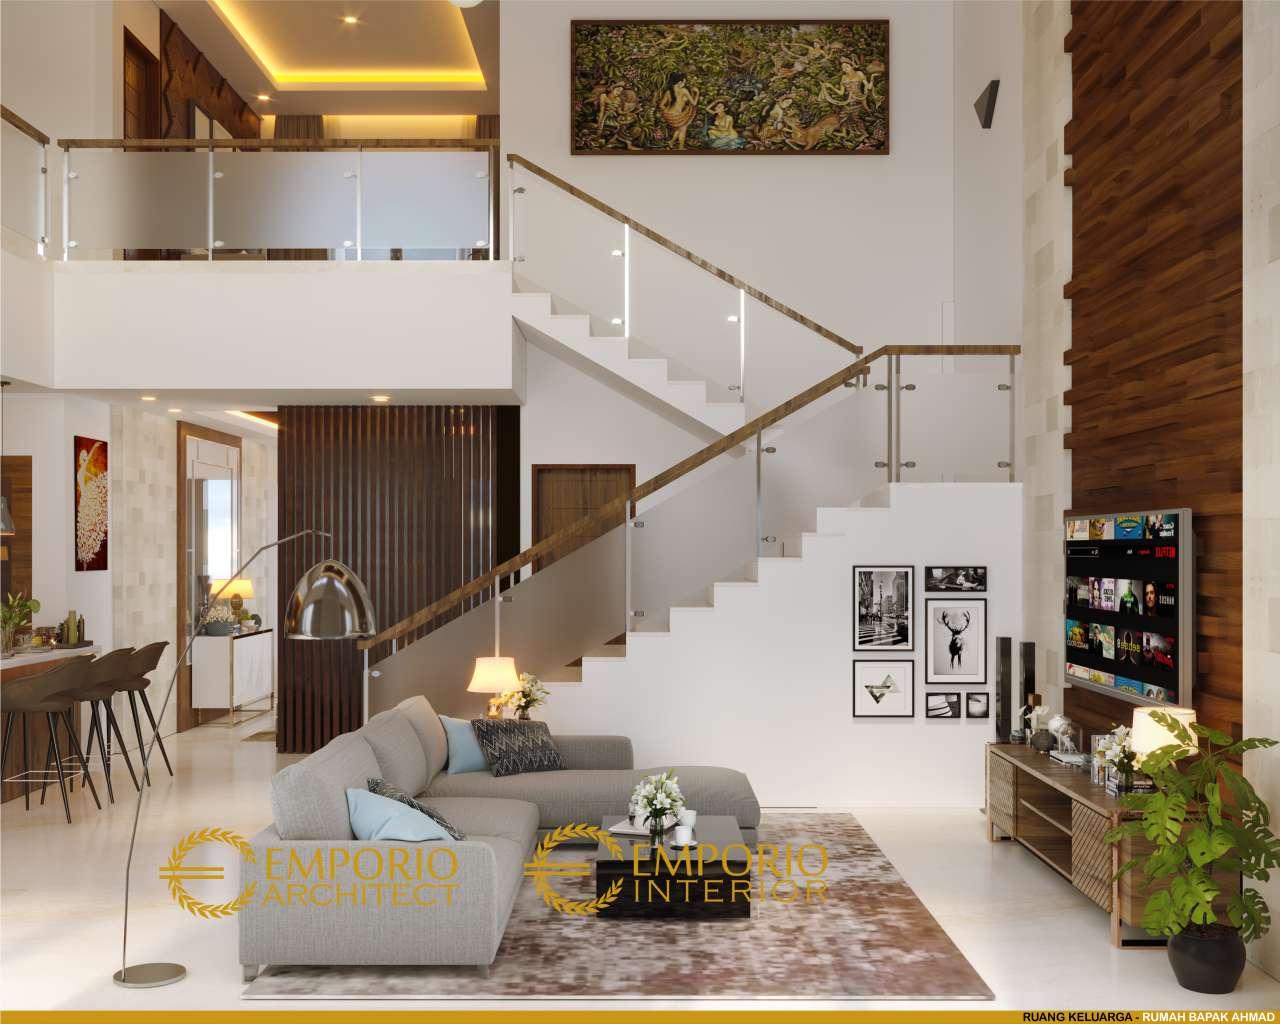 4600 Koleksi Desain Perumahan Jawa Tengah Gratis